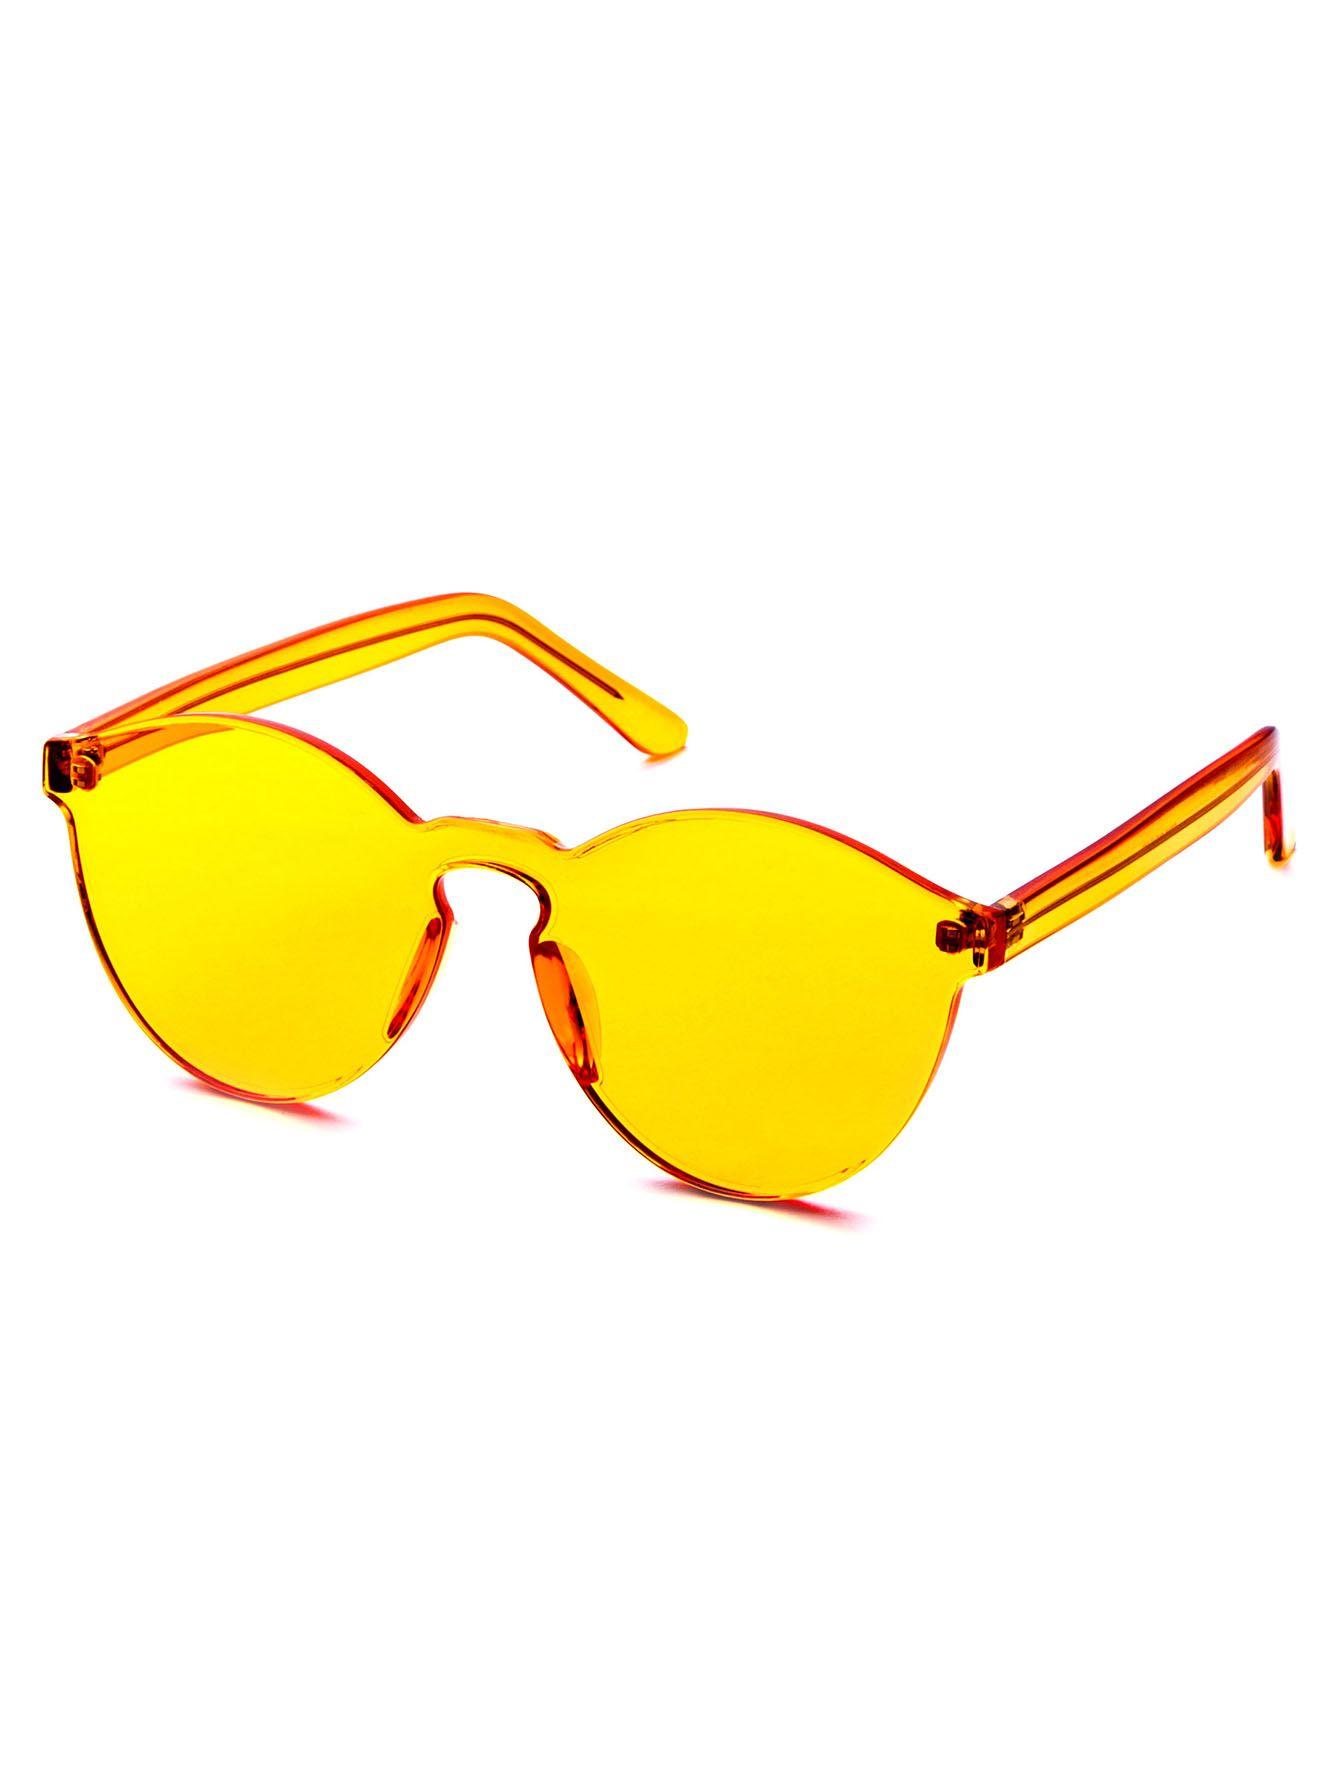 sunglasses offers online  Orange Clear One Piece Retro Style Sunglasses